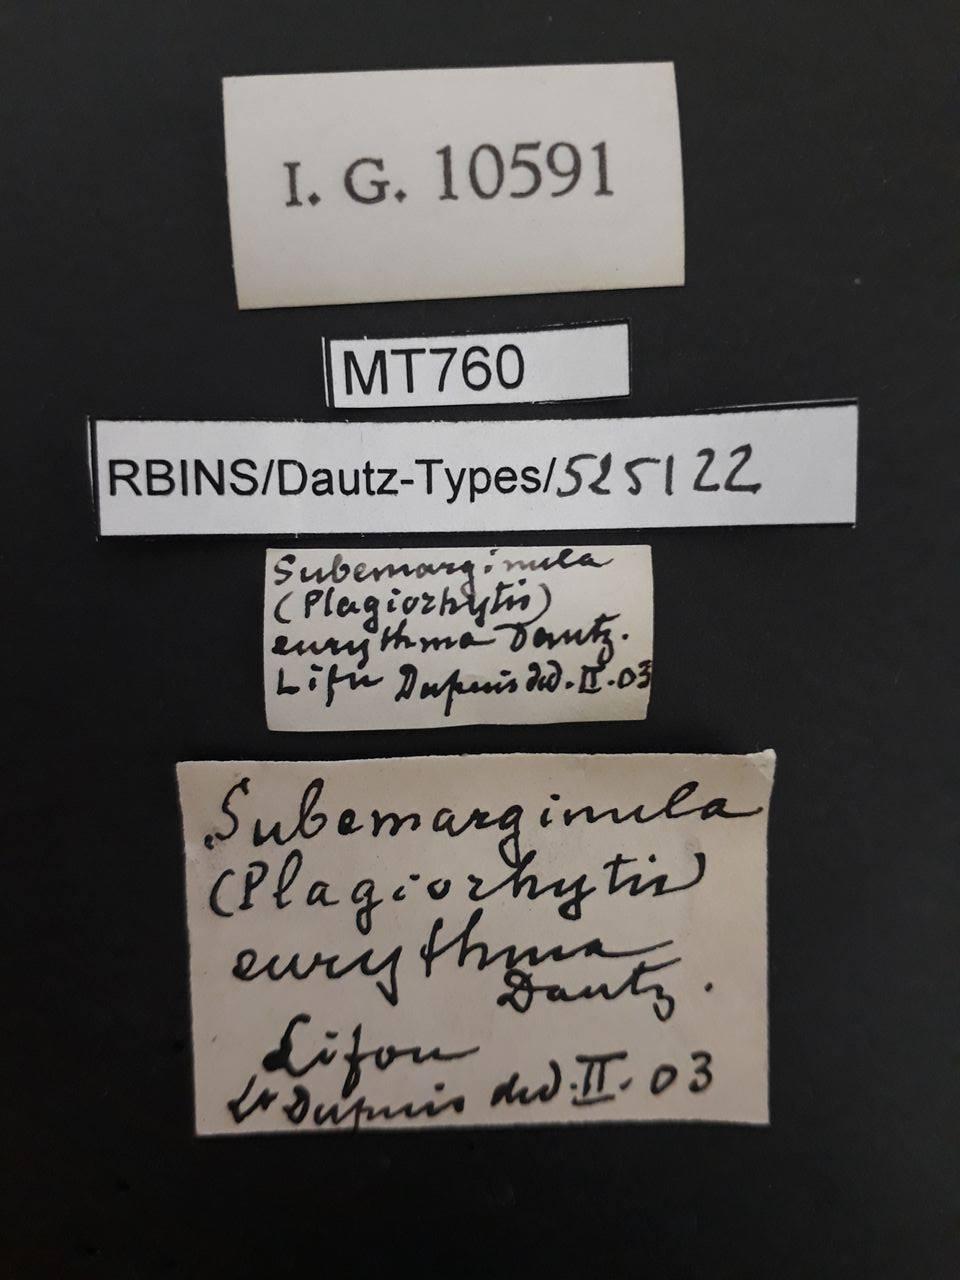 BE-RBINS-INV MT 760 Subemarginula (Plagiorhytis) eurythma pt Lb.jpg